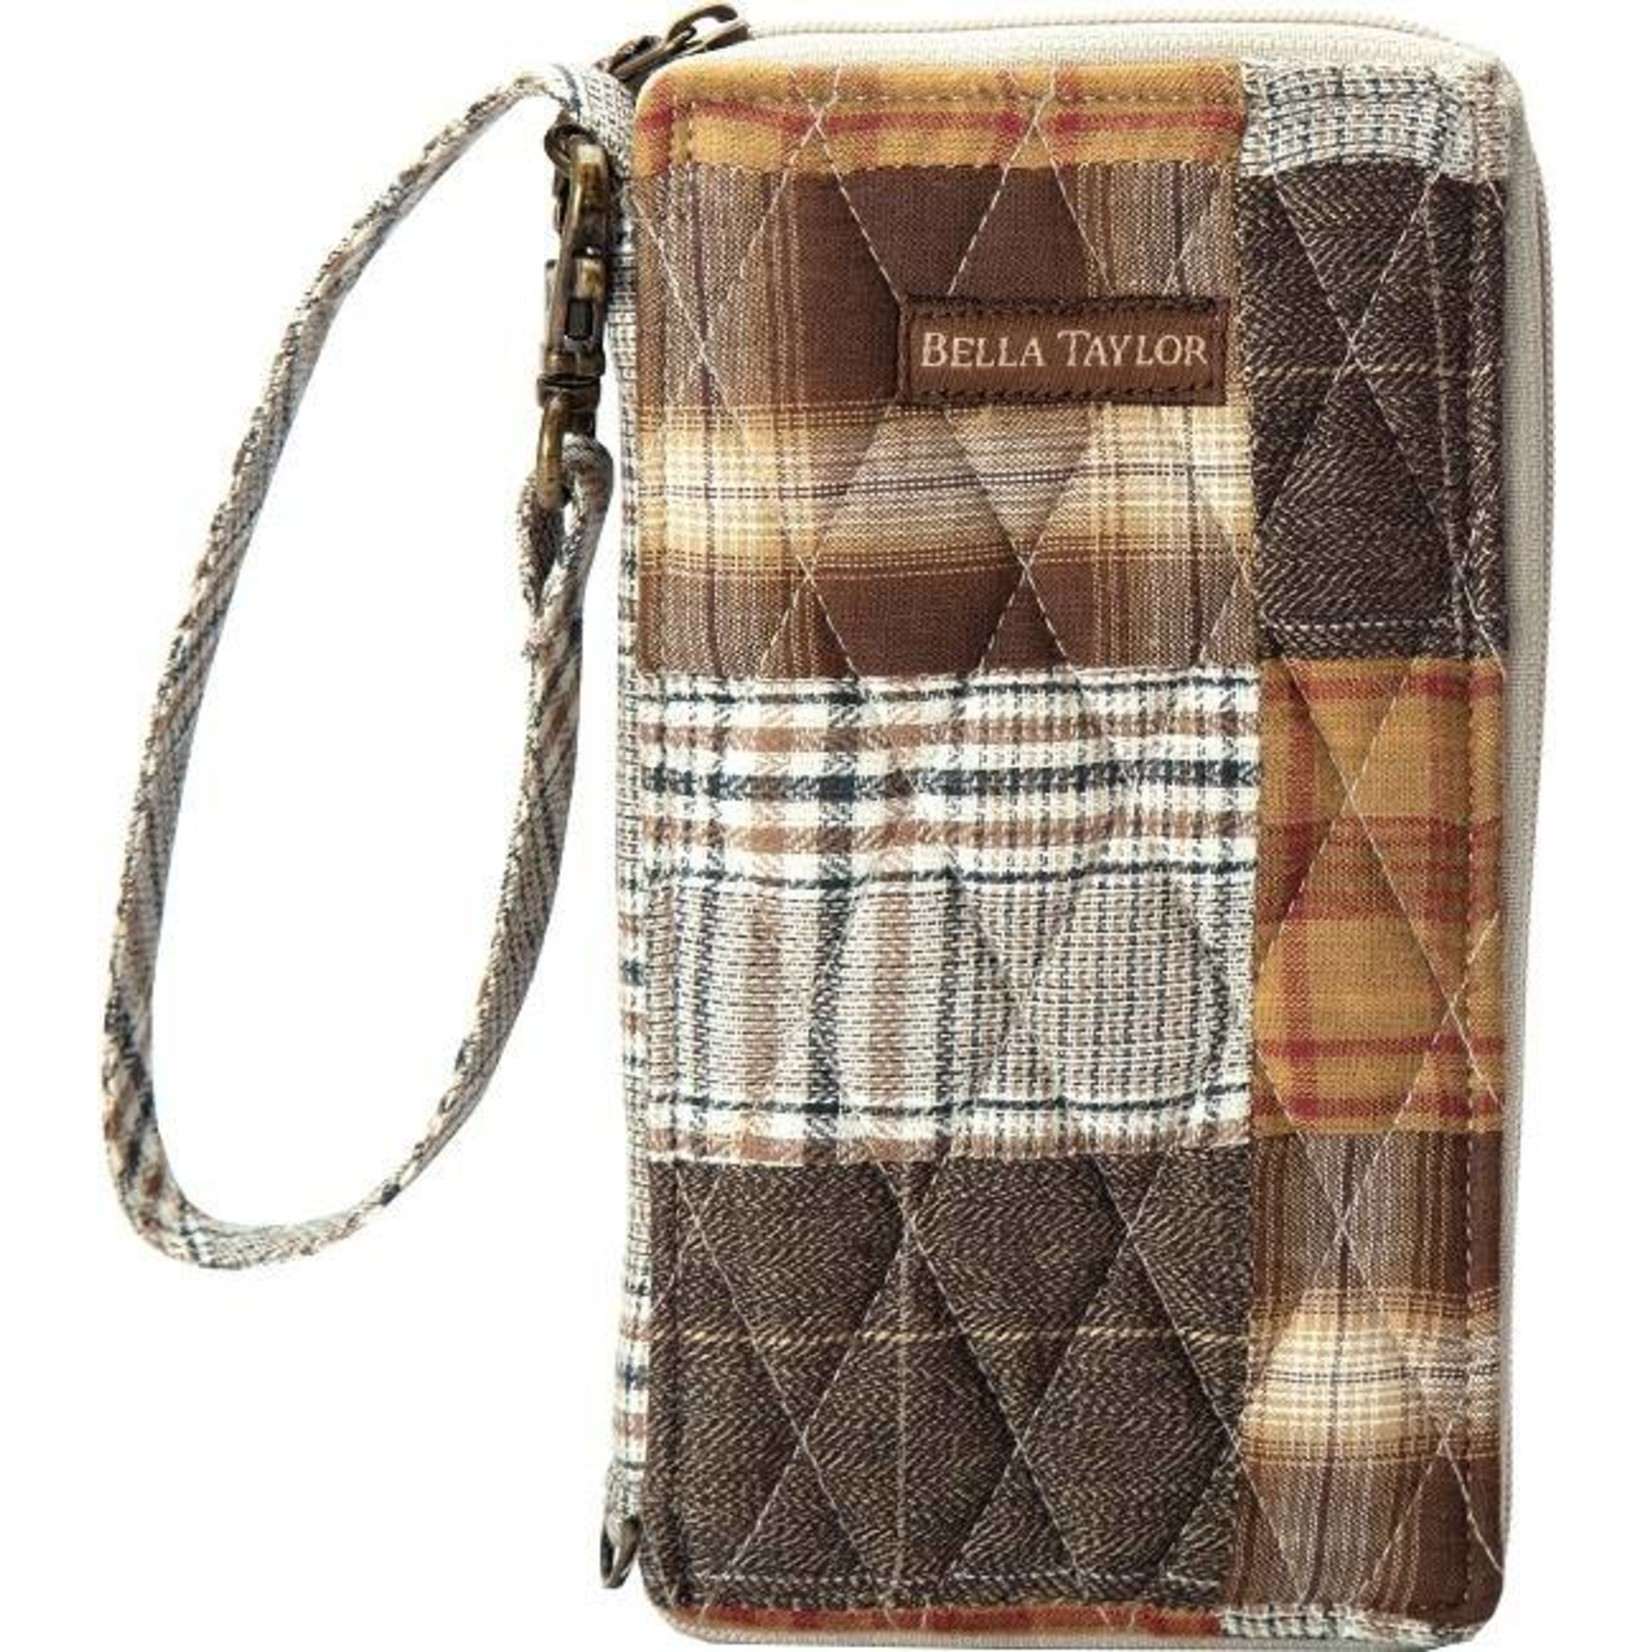 Bella Taylor Rory - Modern Wristlet Wallet